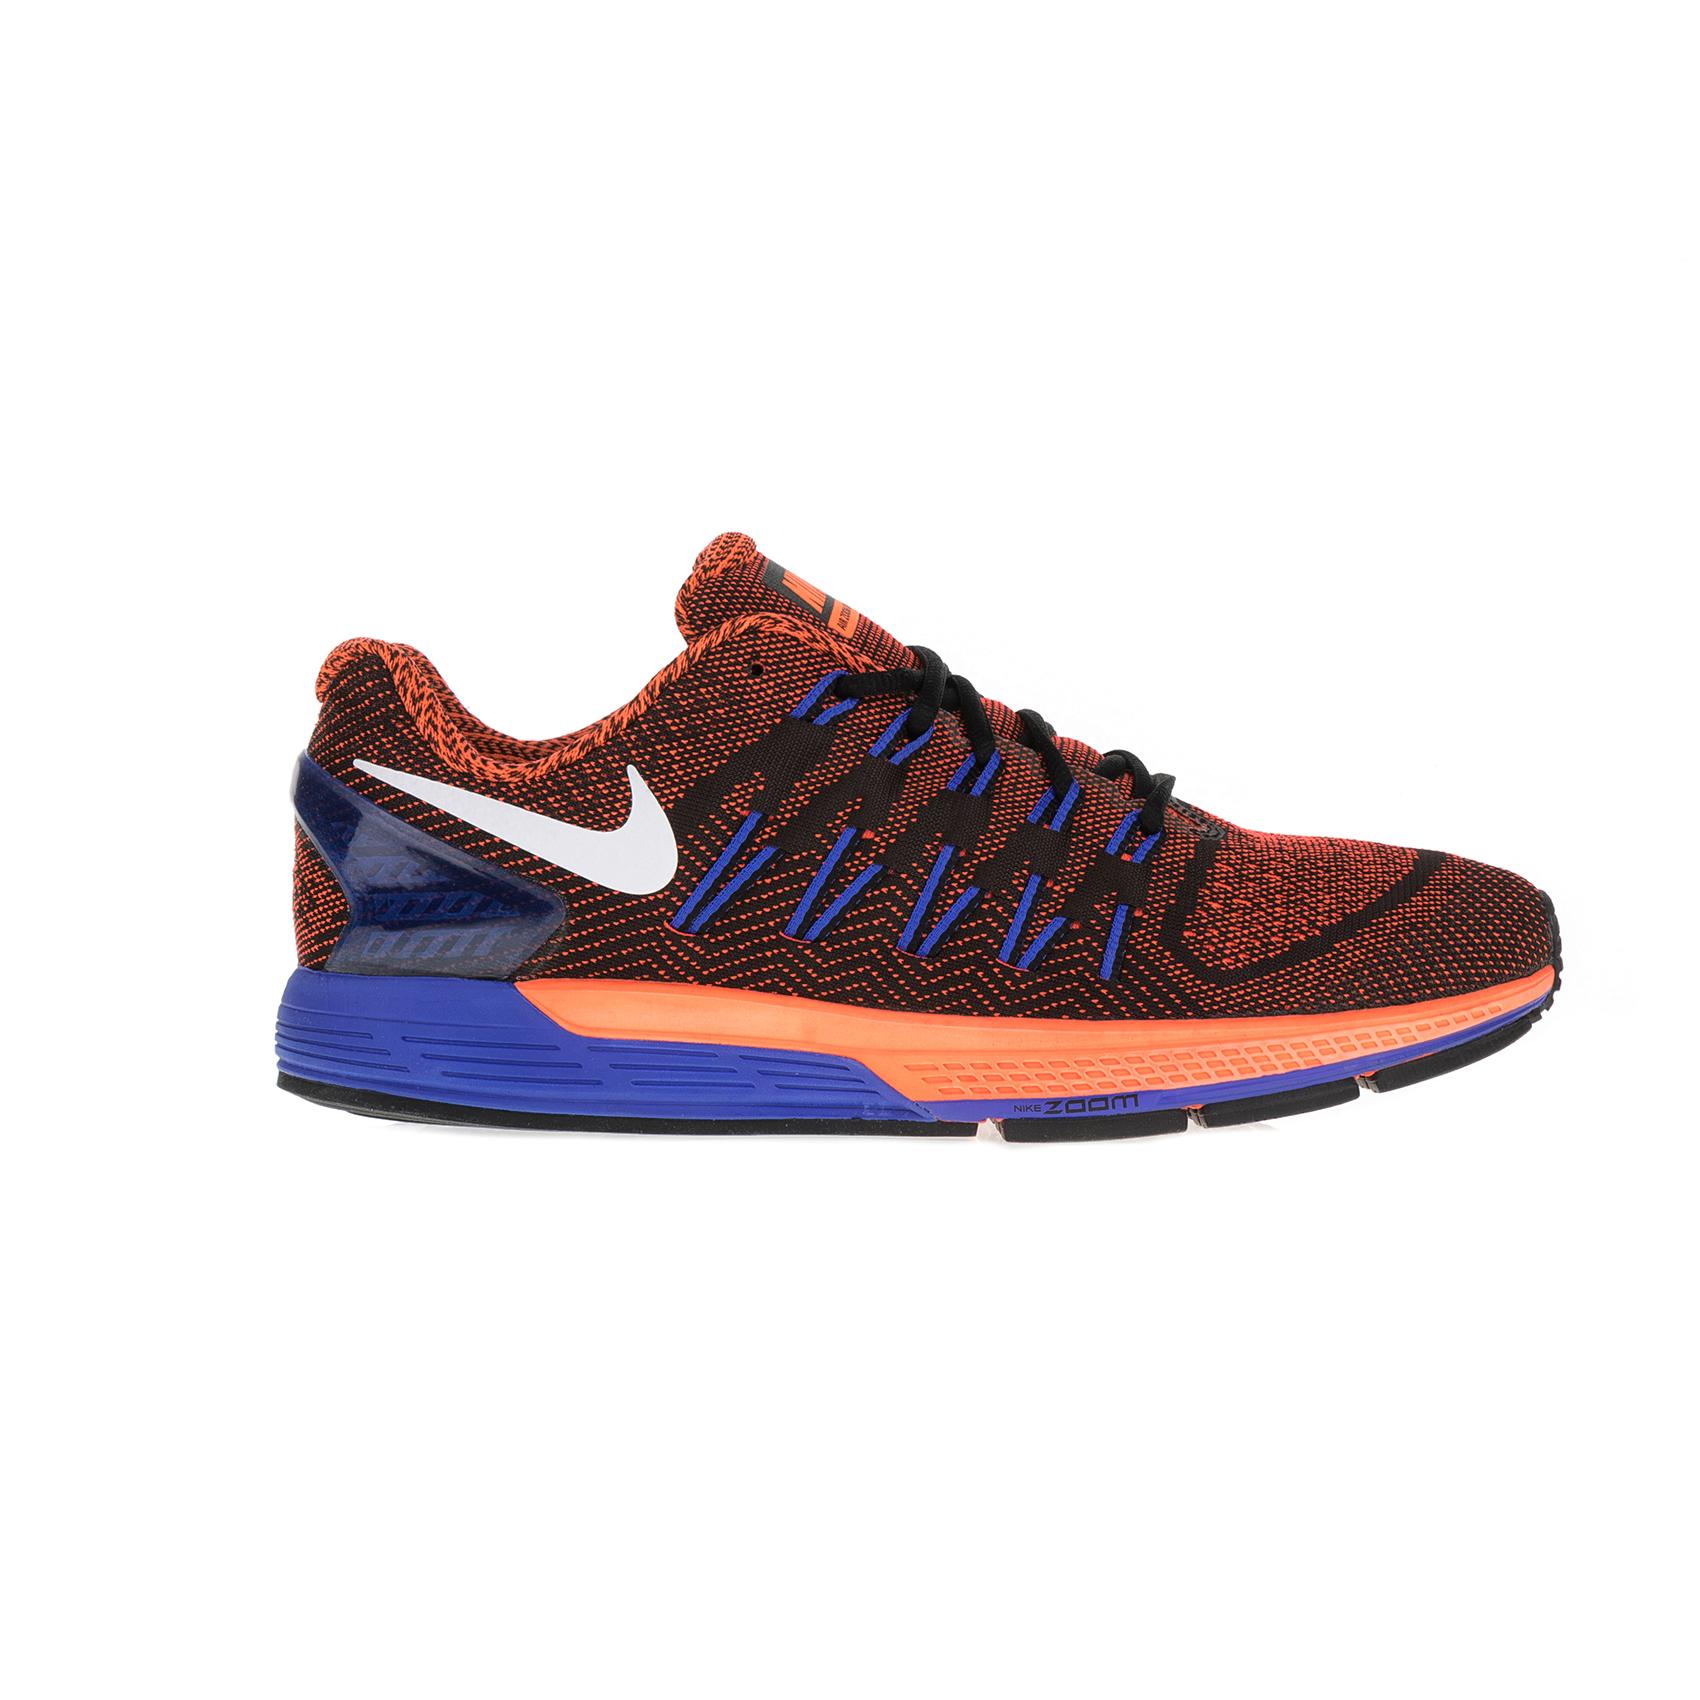 NIKE – Ανδρικά αθλητικά παπούτσια NIKE AIR ZOOM ODYSSEY πορτοκαλί